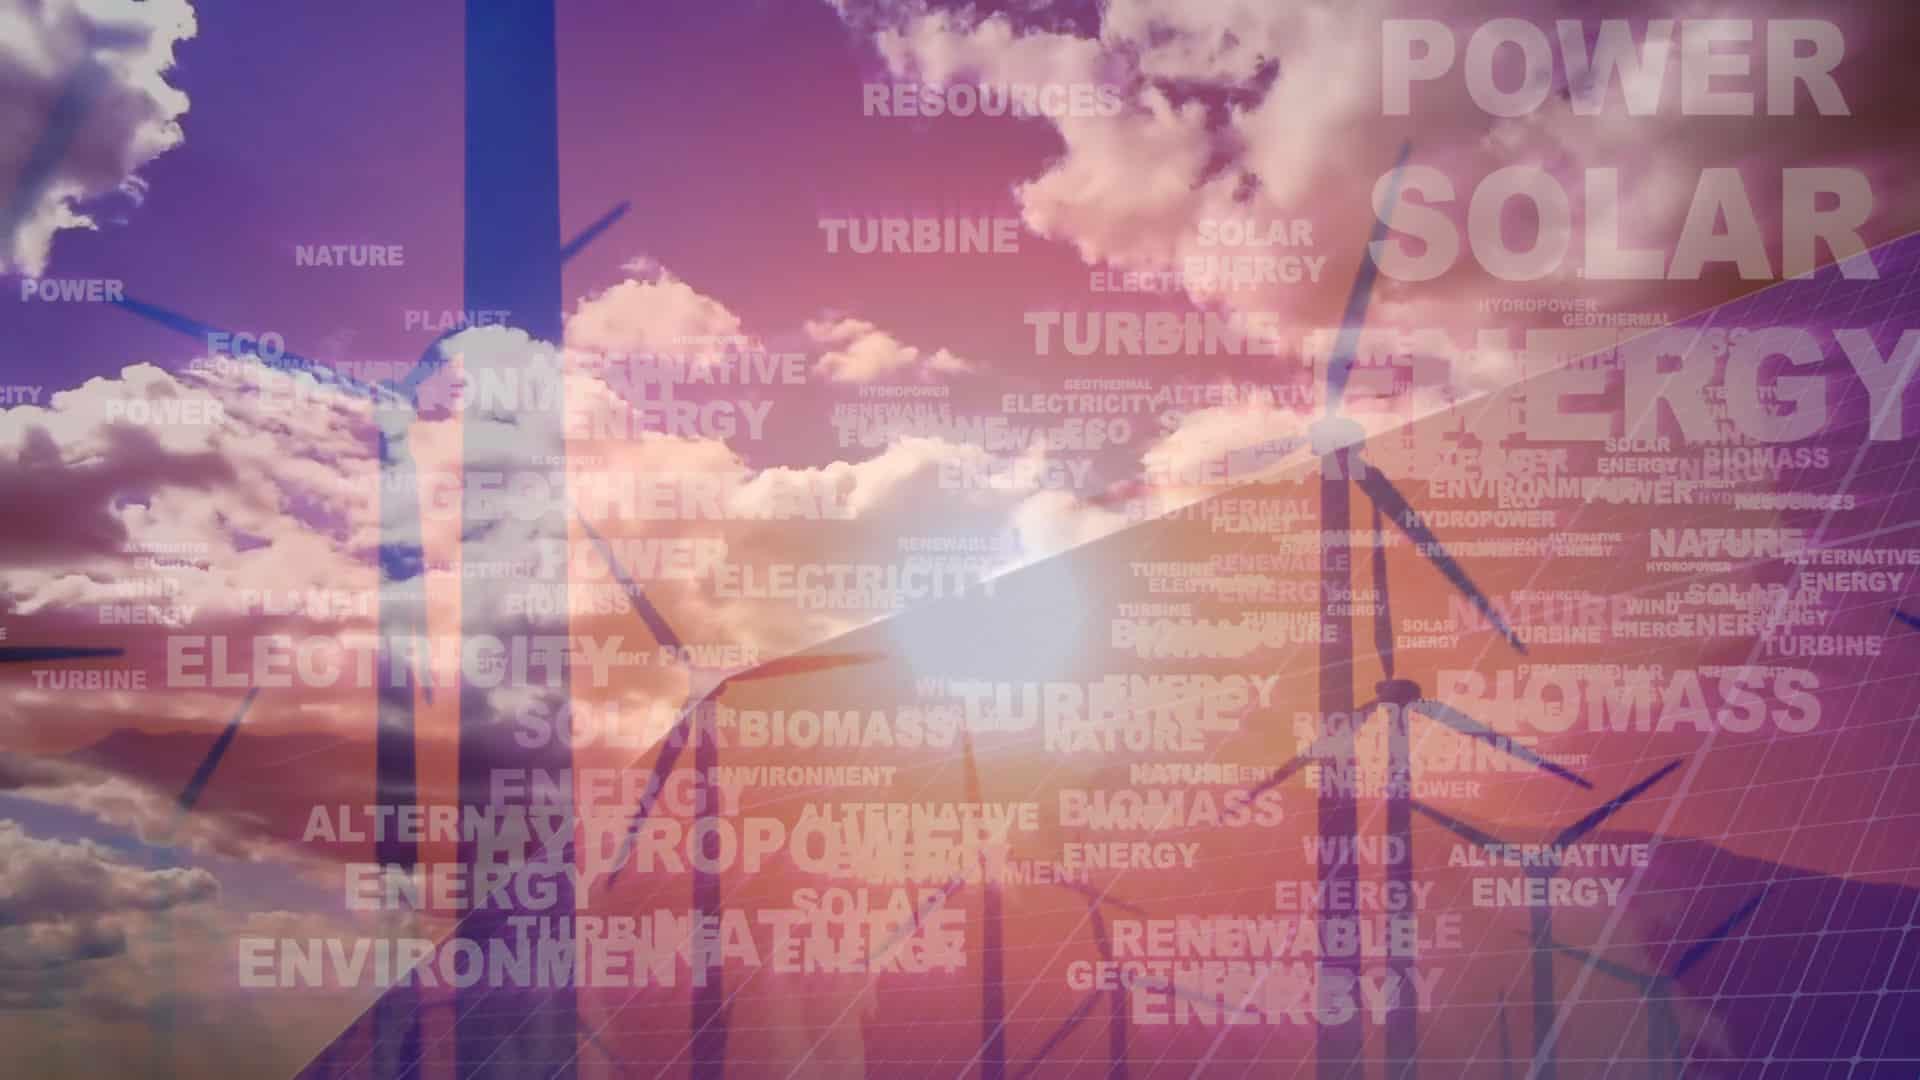 Are Utilities Embracing Alternative Energy